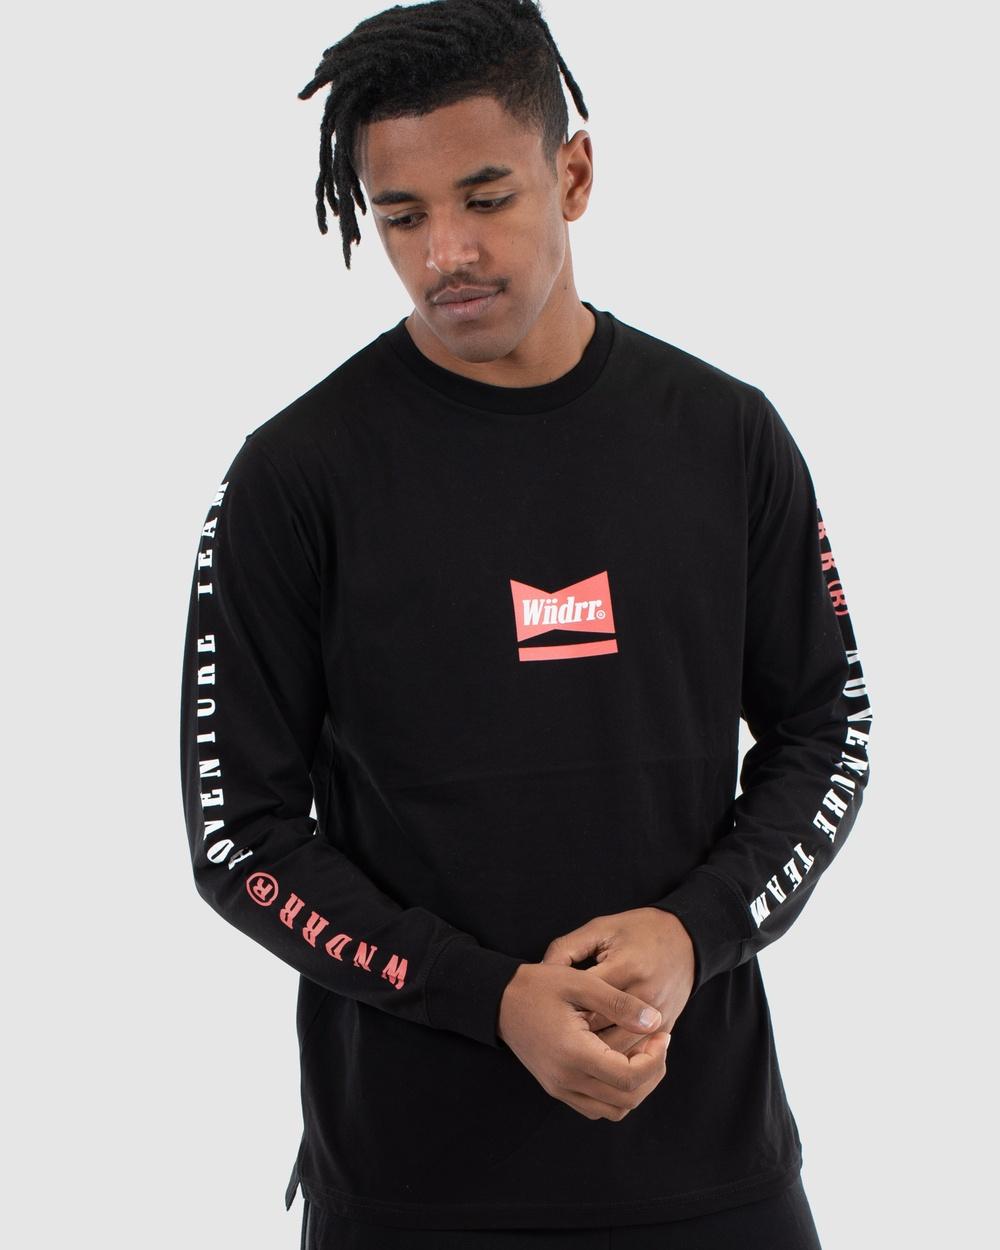 WNDRR - Chadwick Long Sleeve Tee - Long Sleeve T-Shirts (Black) Chadwick Long Sleeve Tee